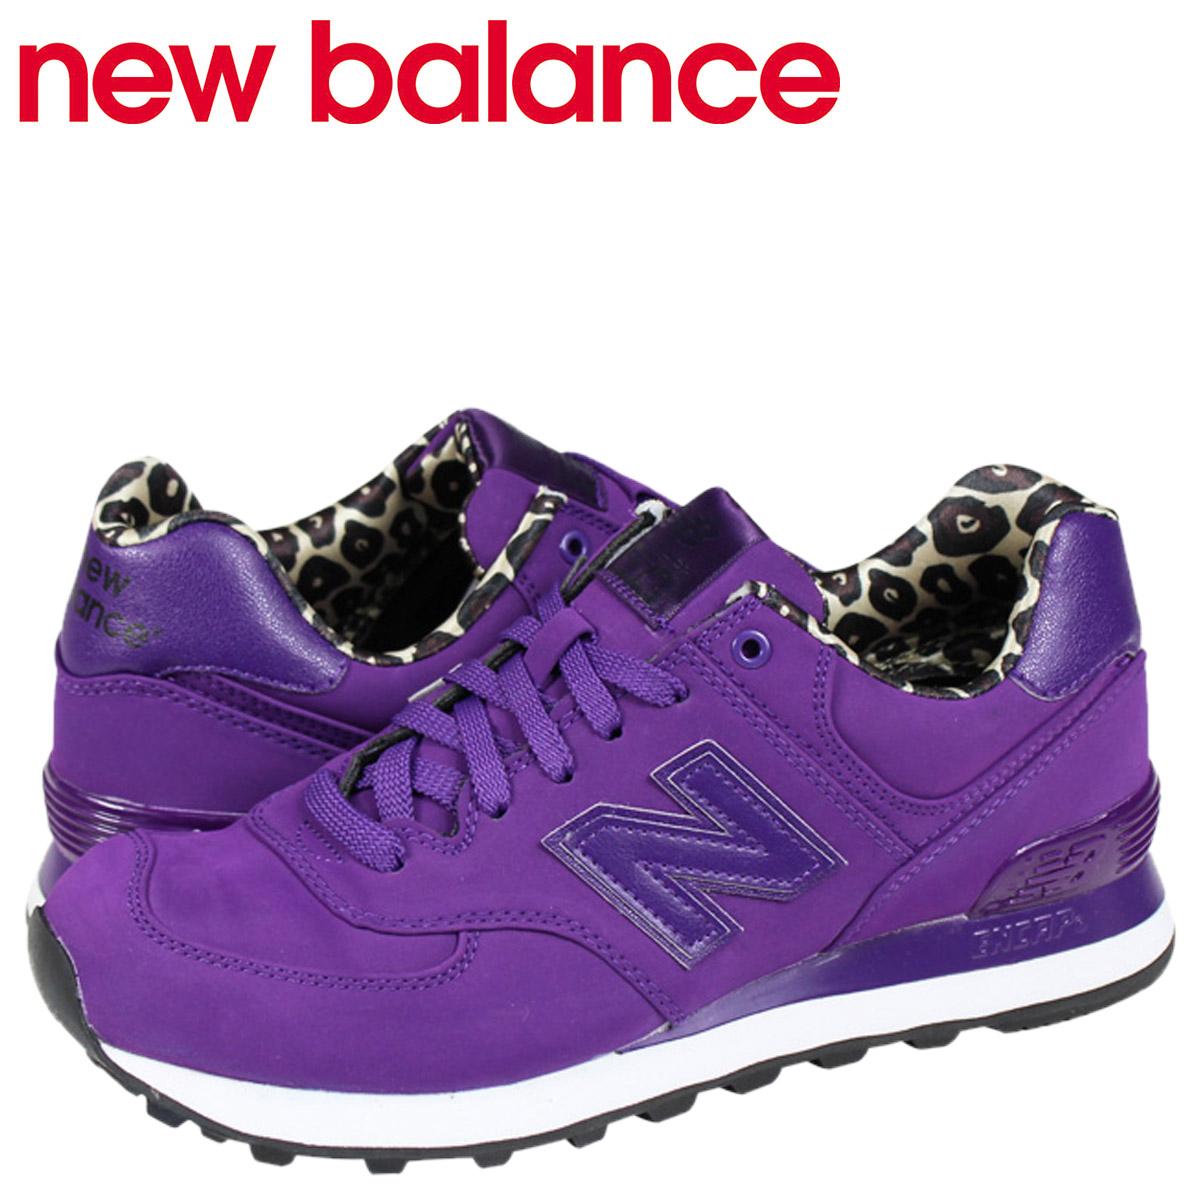 Wise B Sneakers Online ShopNew Wl574spp Sneak Balance bf6gvY7y